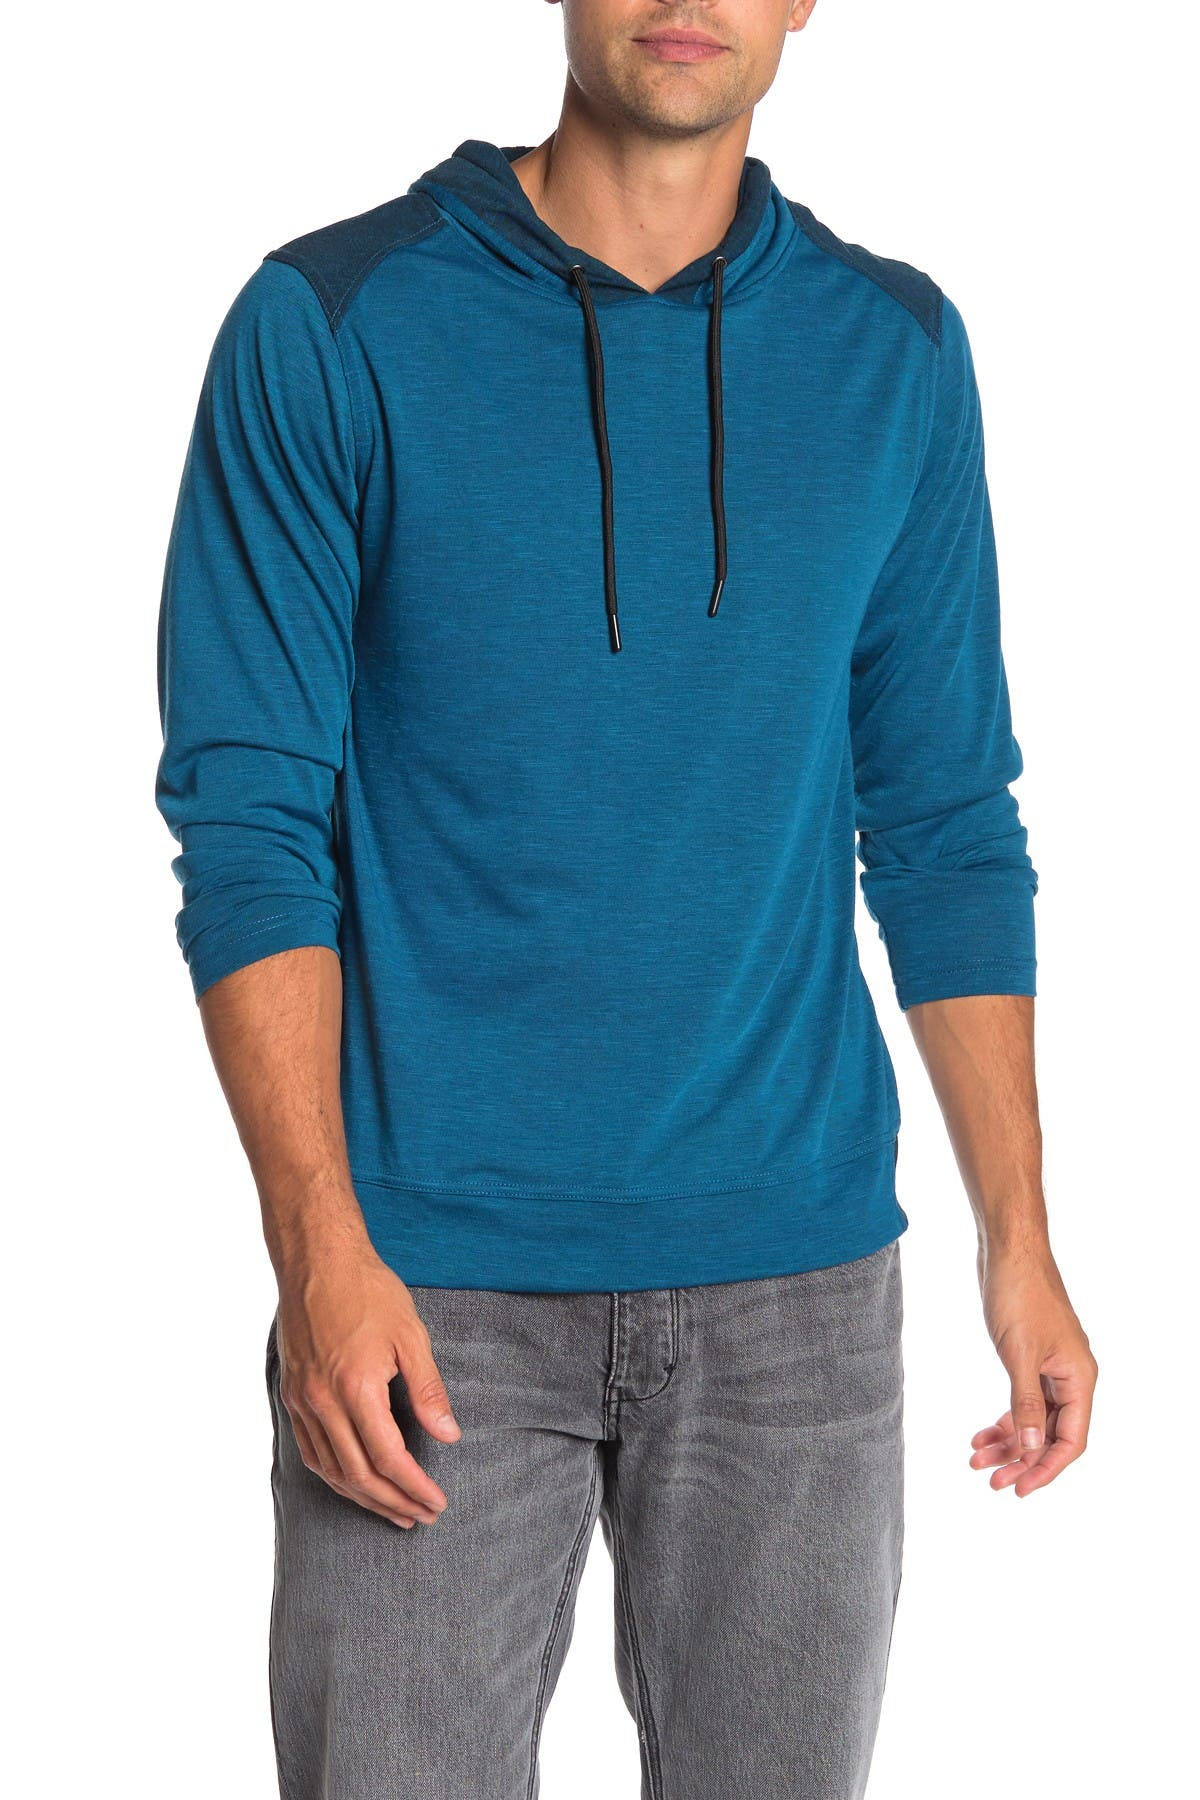 Image of Burnside Colorblock Paneled Pullover Hoodie